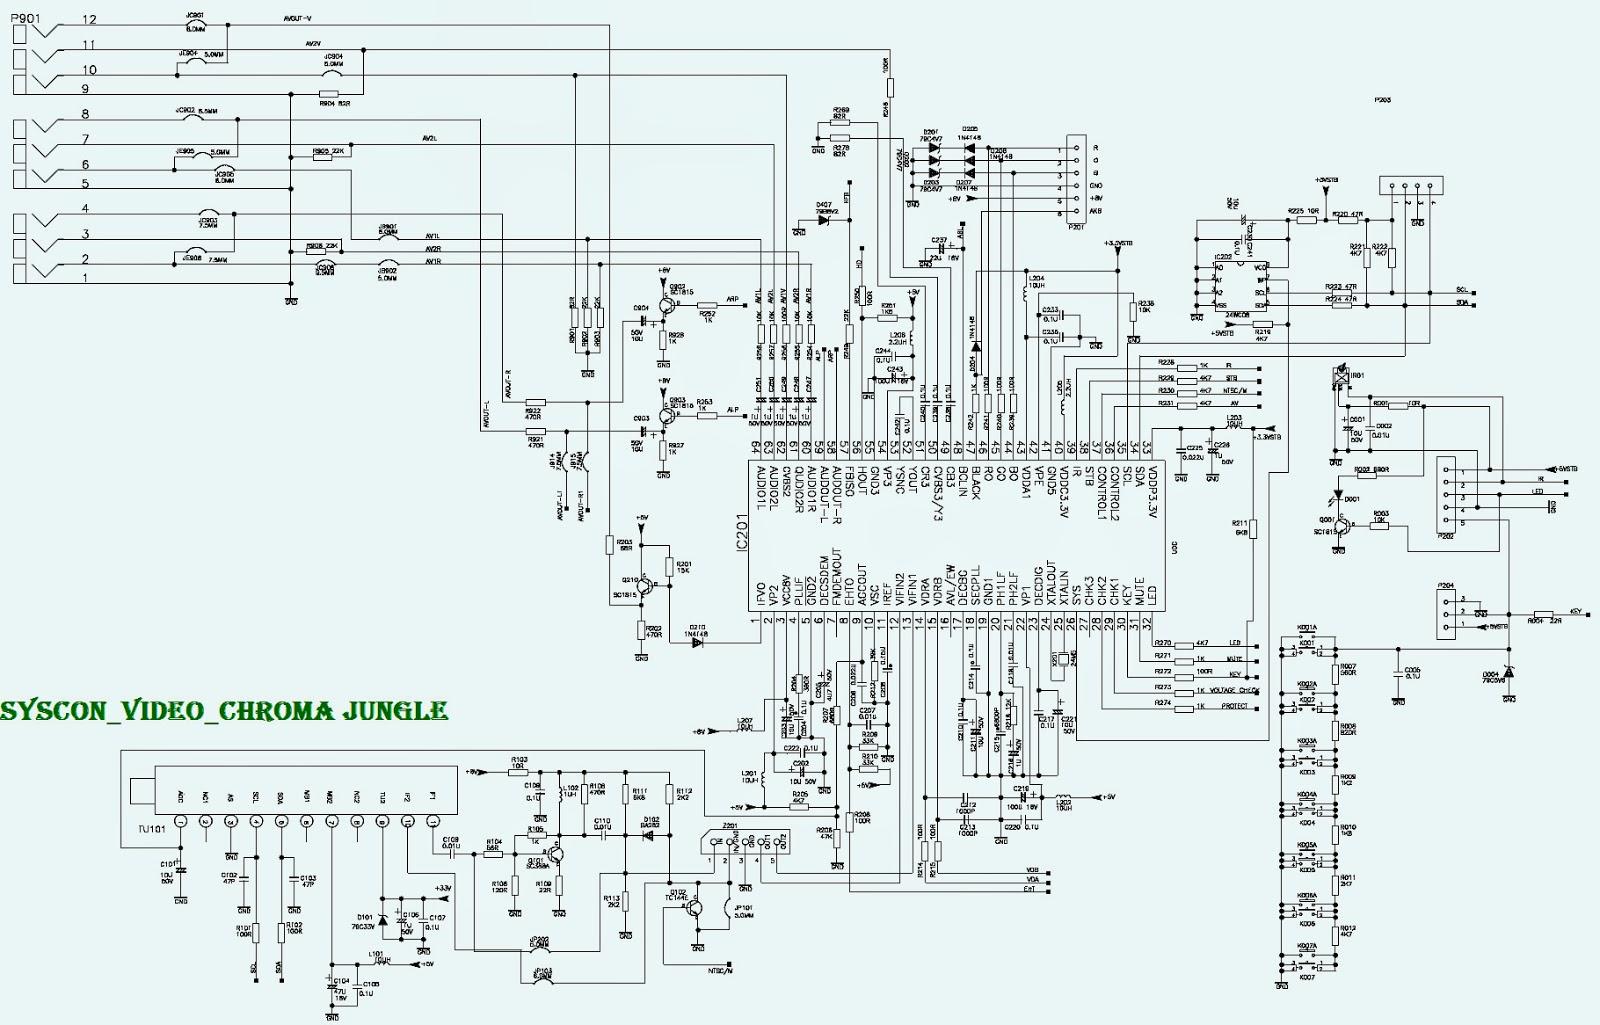 21K77  TCL CRT TV  SCHEMATIC [Circuit Diagram)   Electro